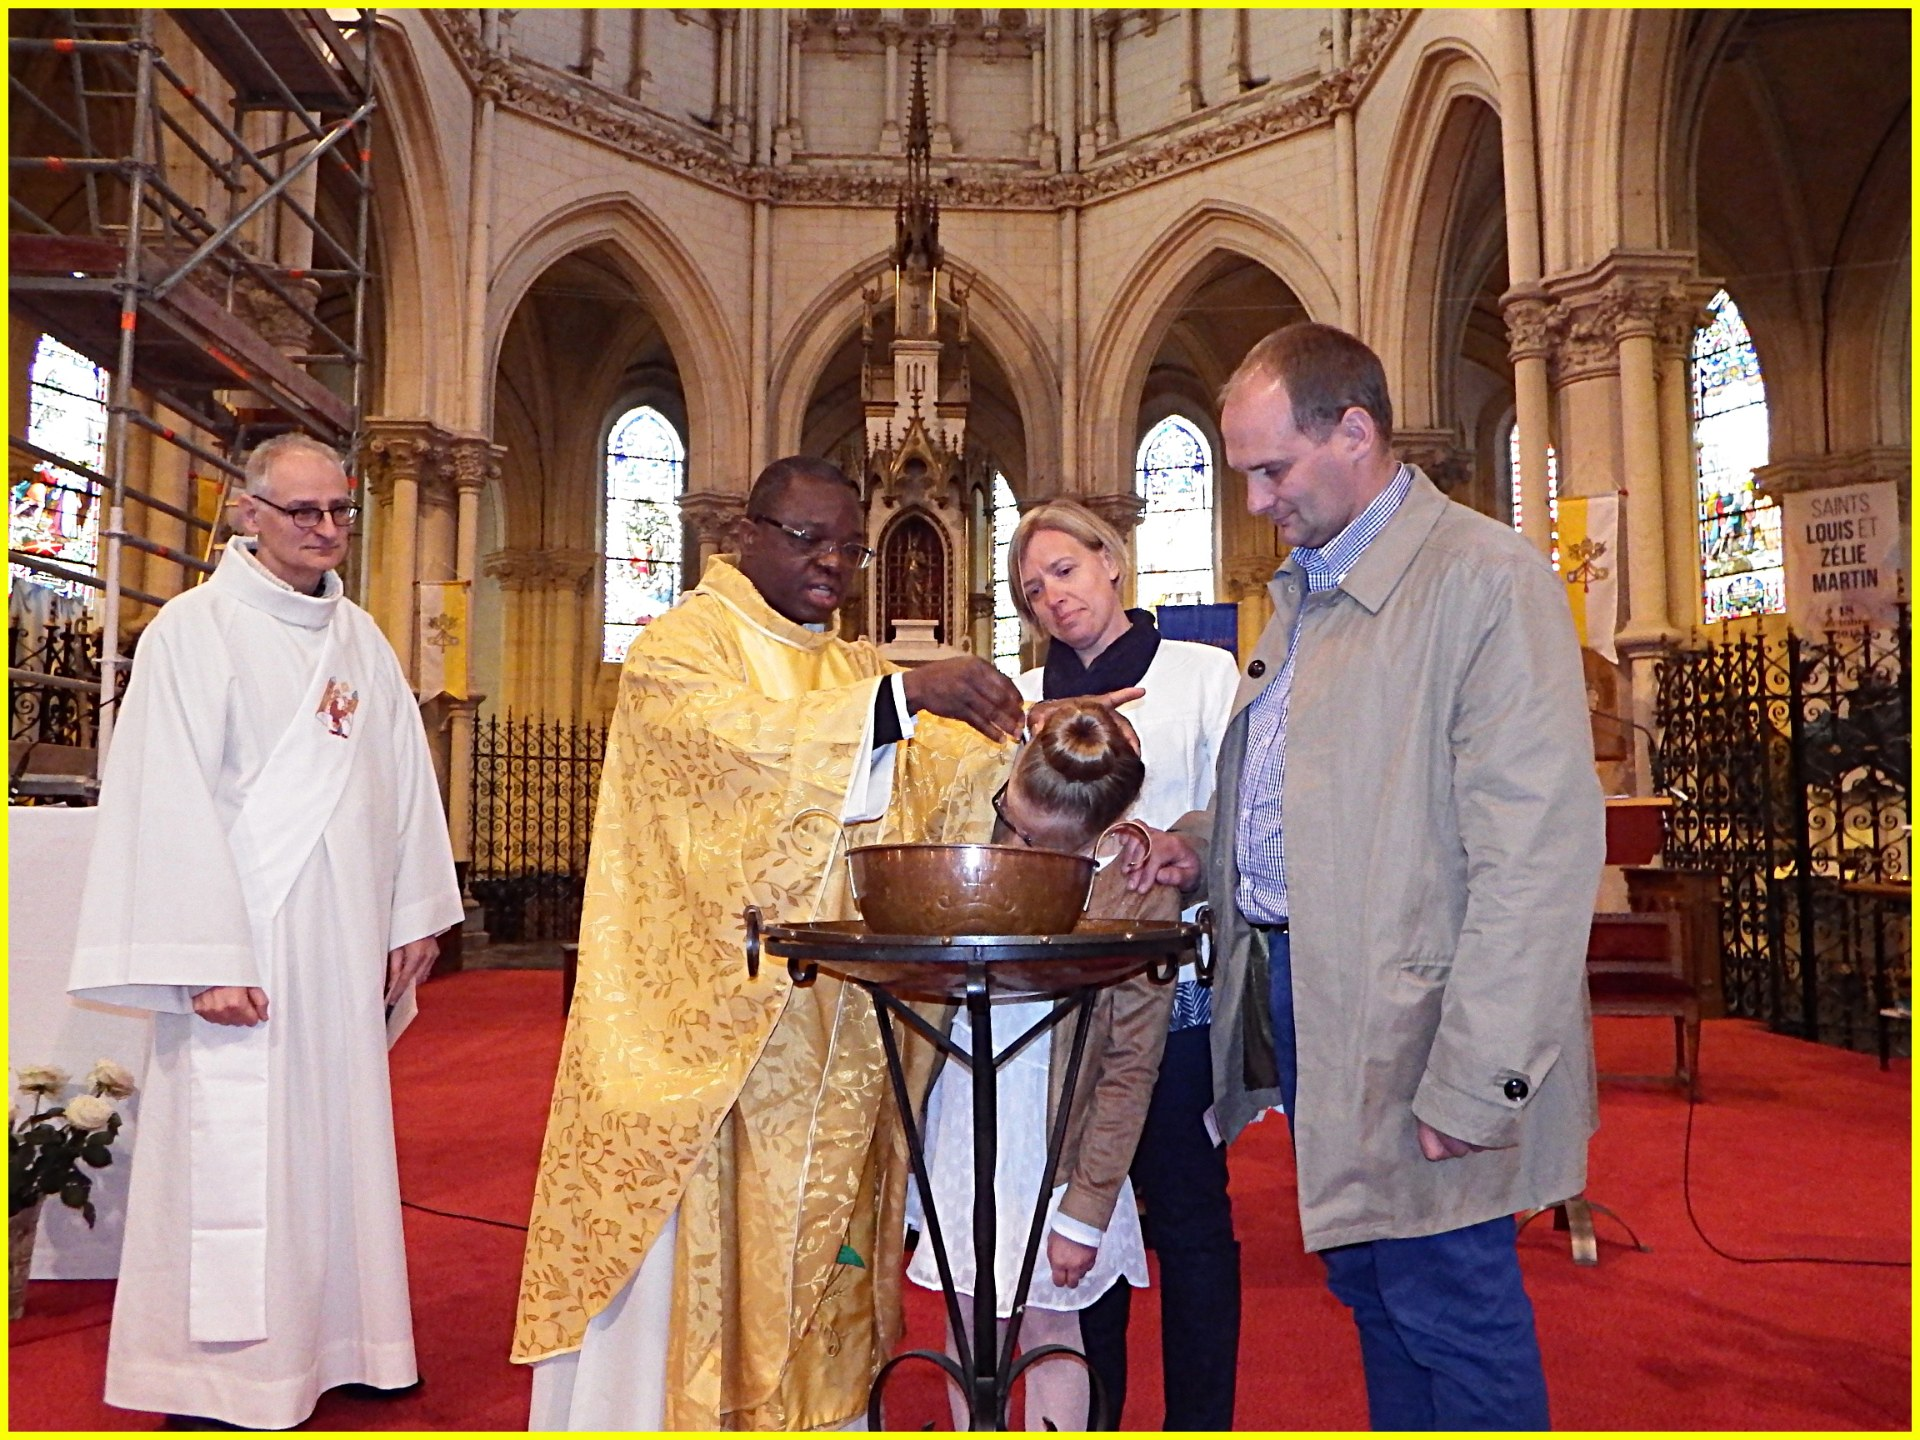 Baptême d'Emma(10 ans)par l'abbé I. Delouh en présence des parents d'Emma